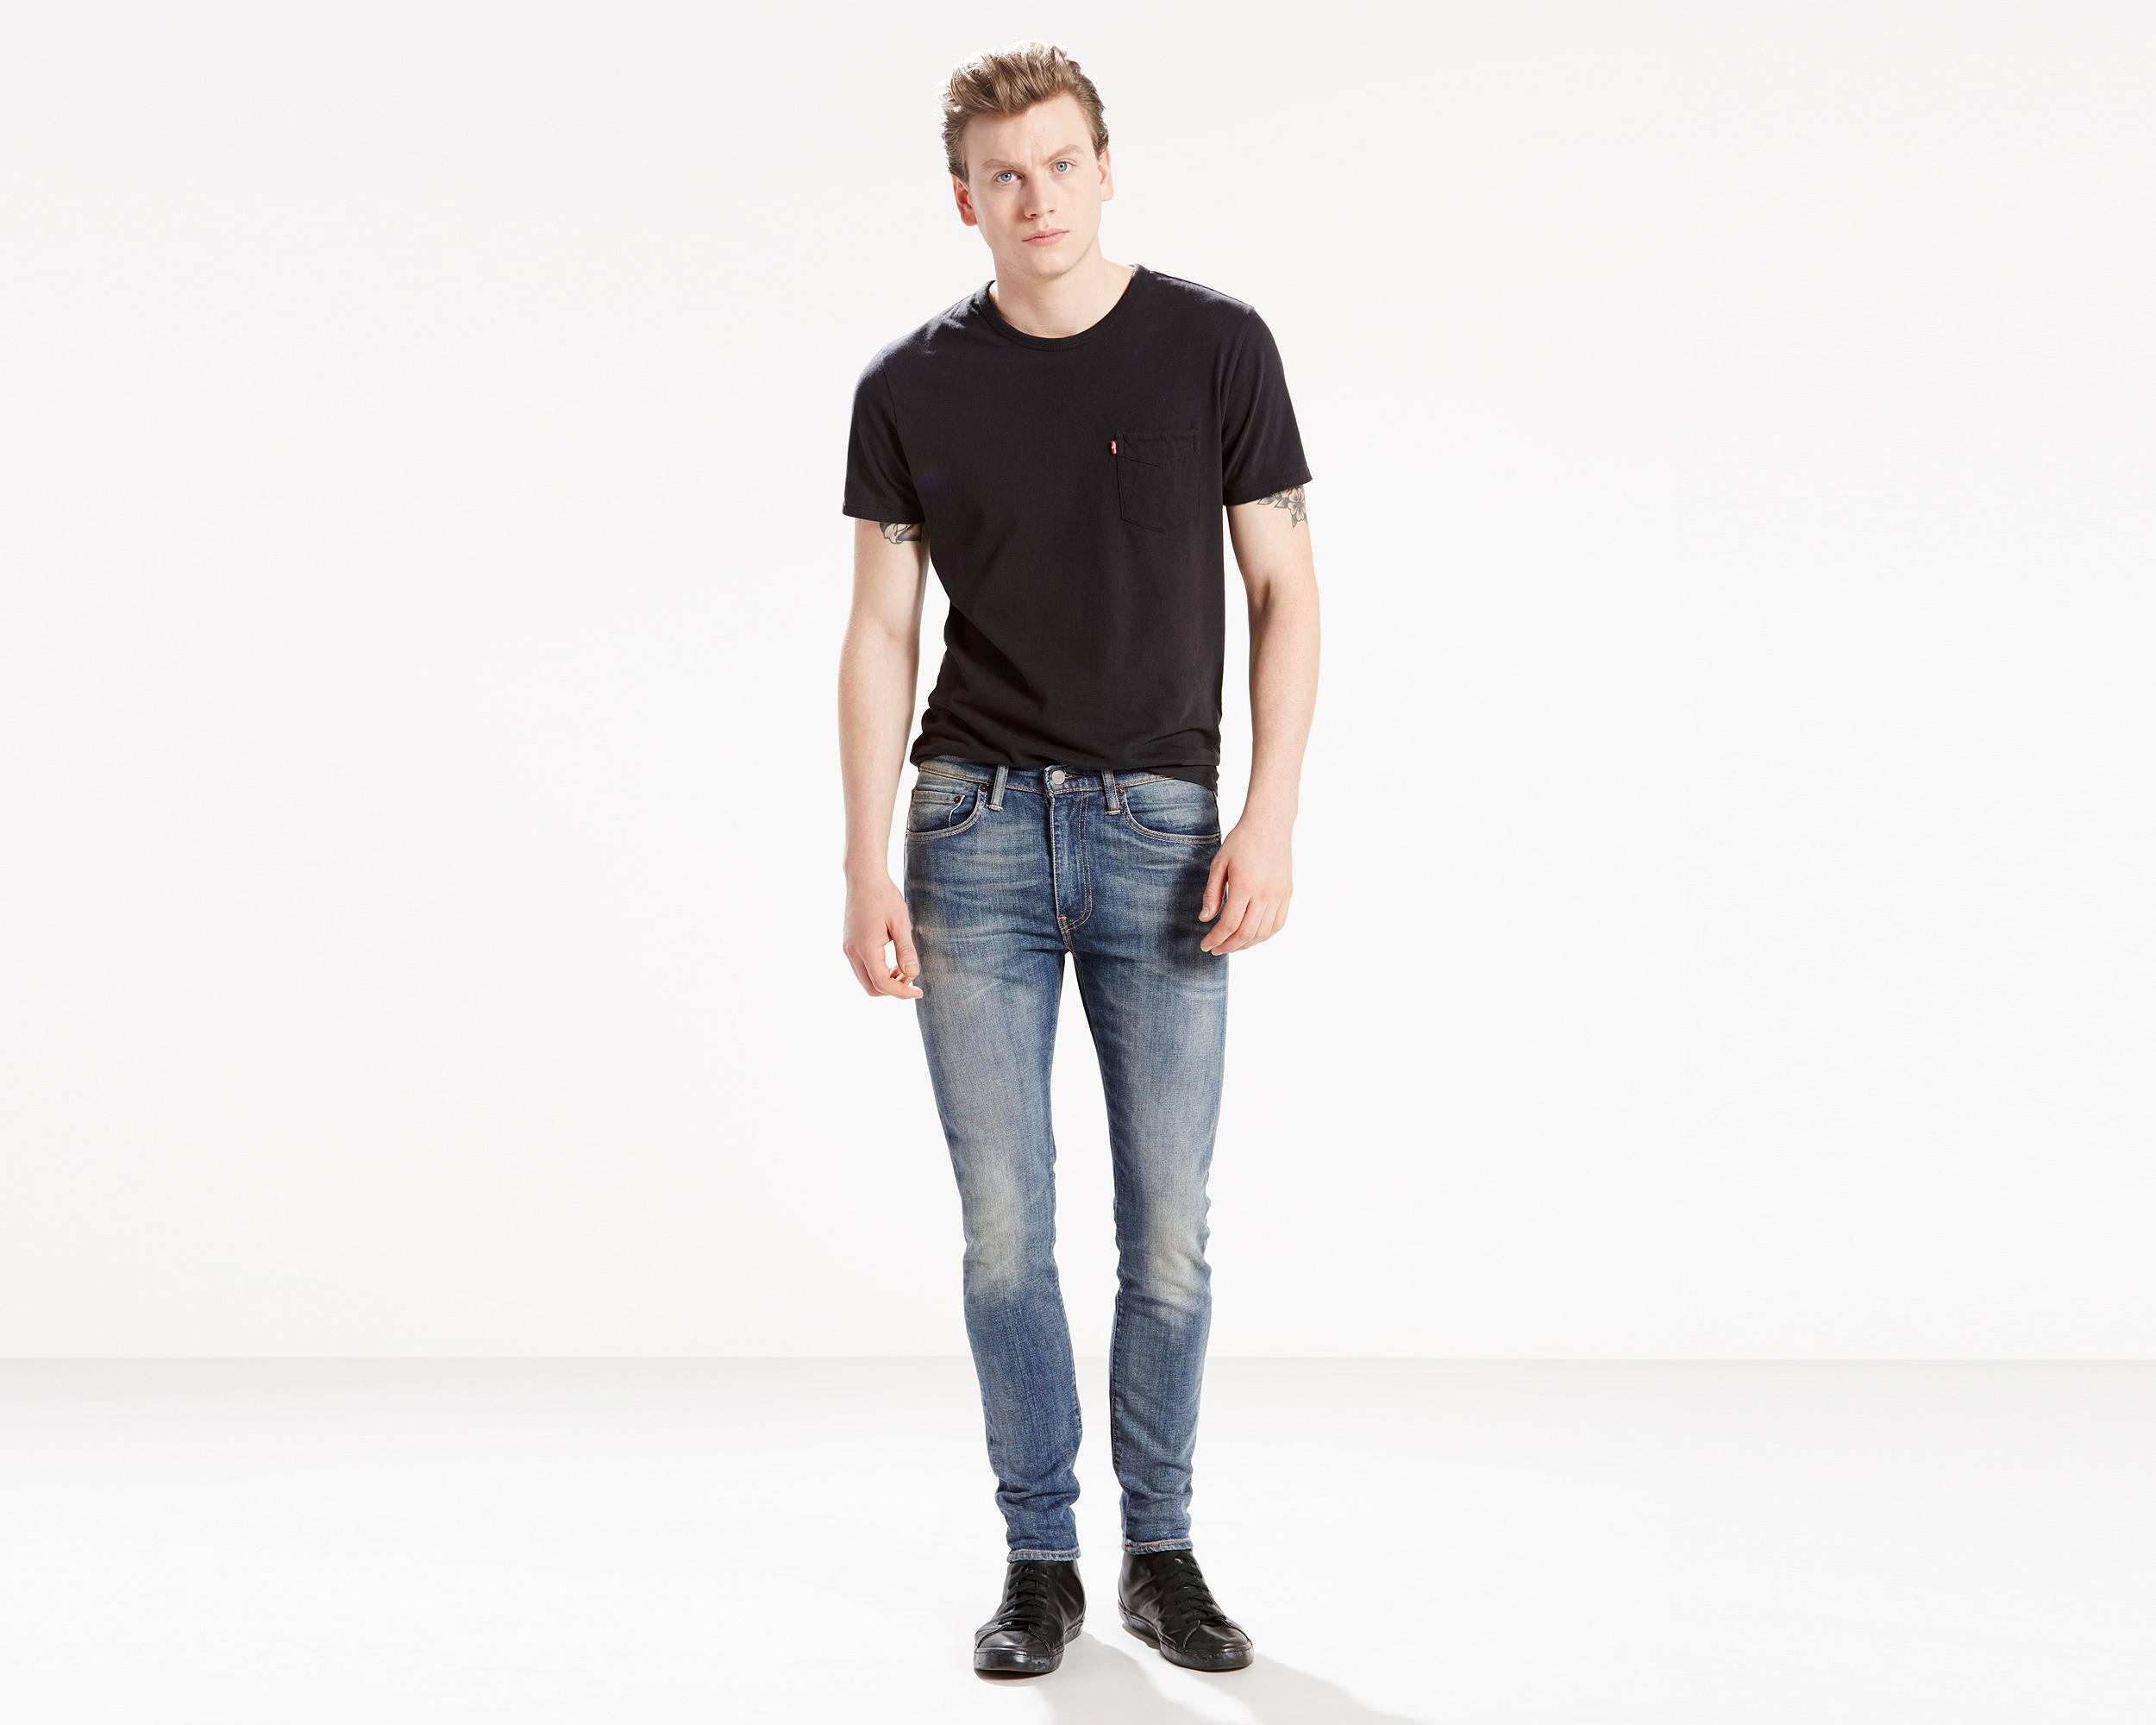 519™ Extreme Skinny Stretch Jeans | Wilderness |Levi's® United ...